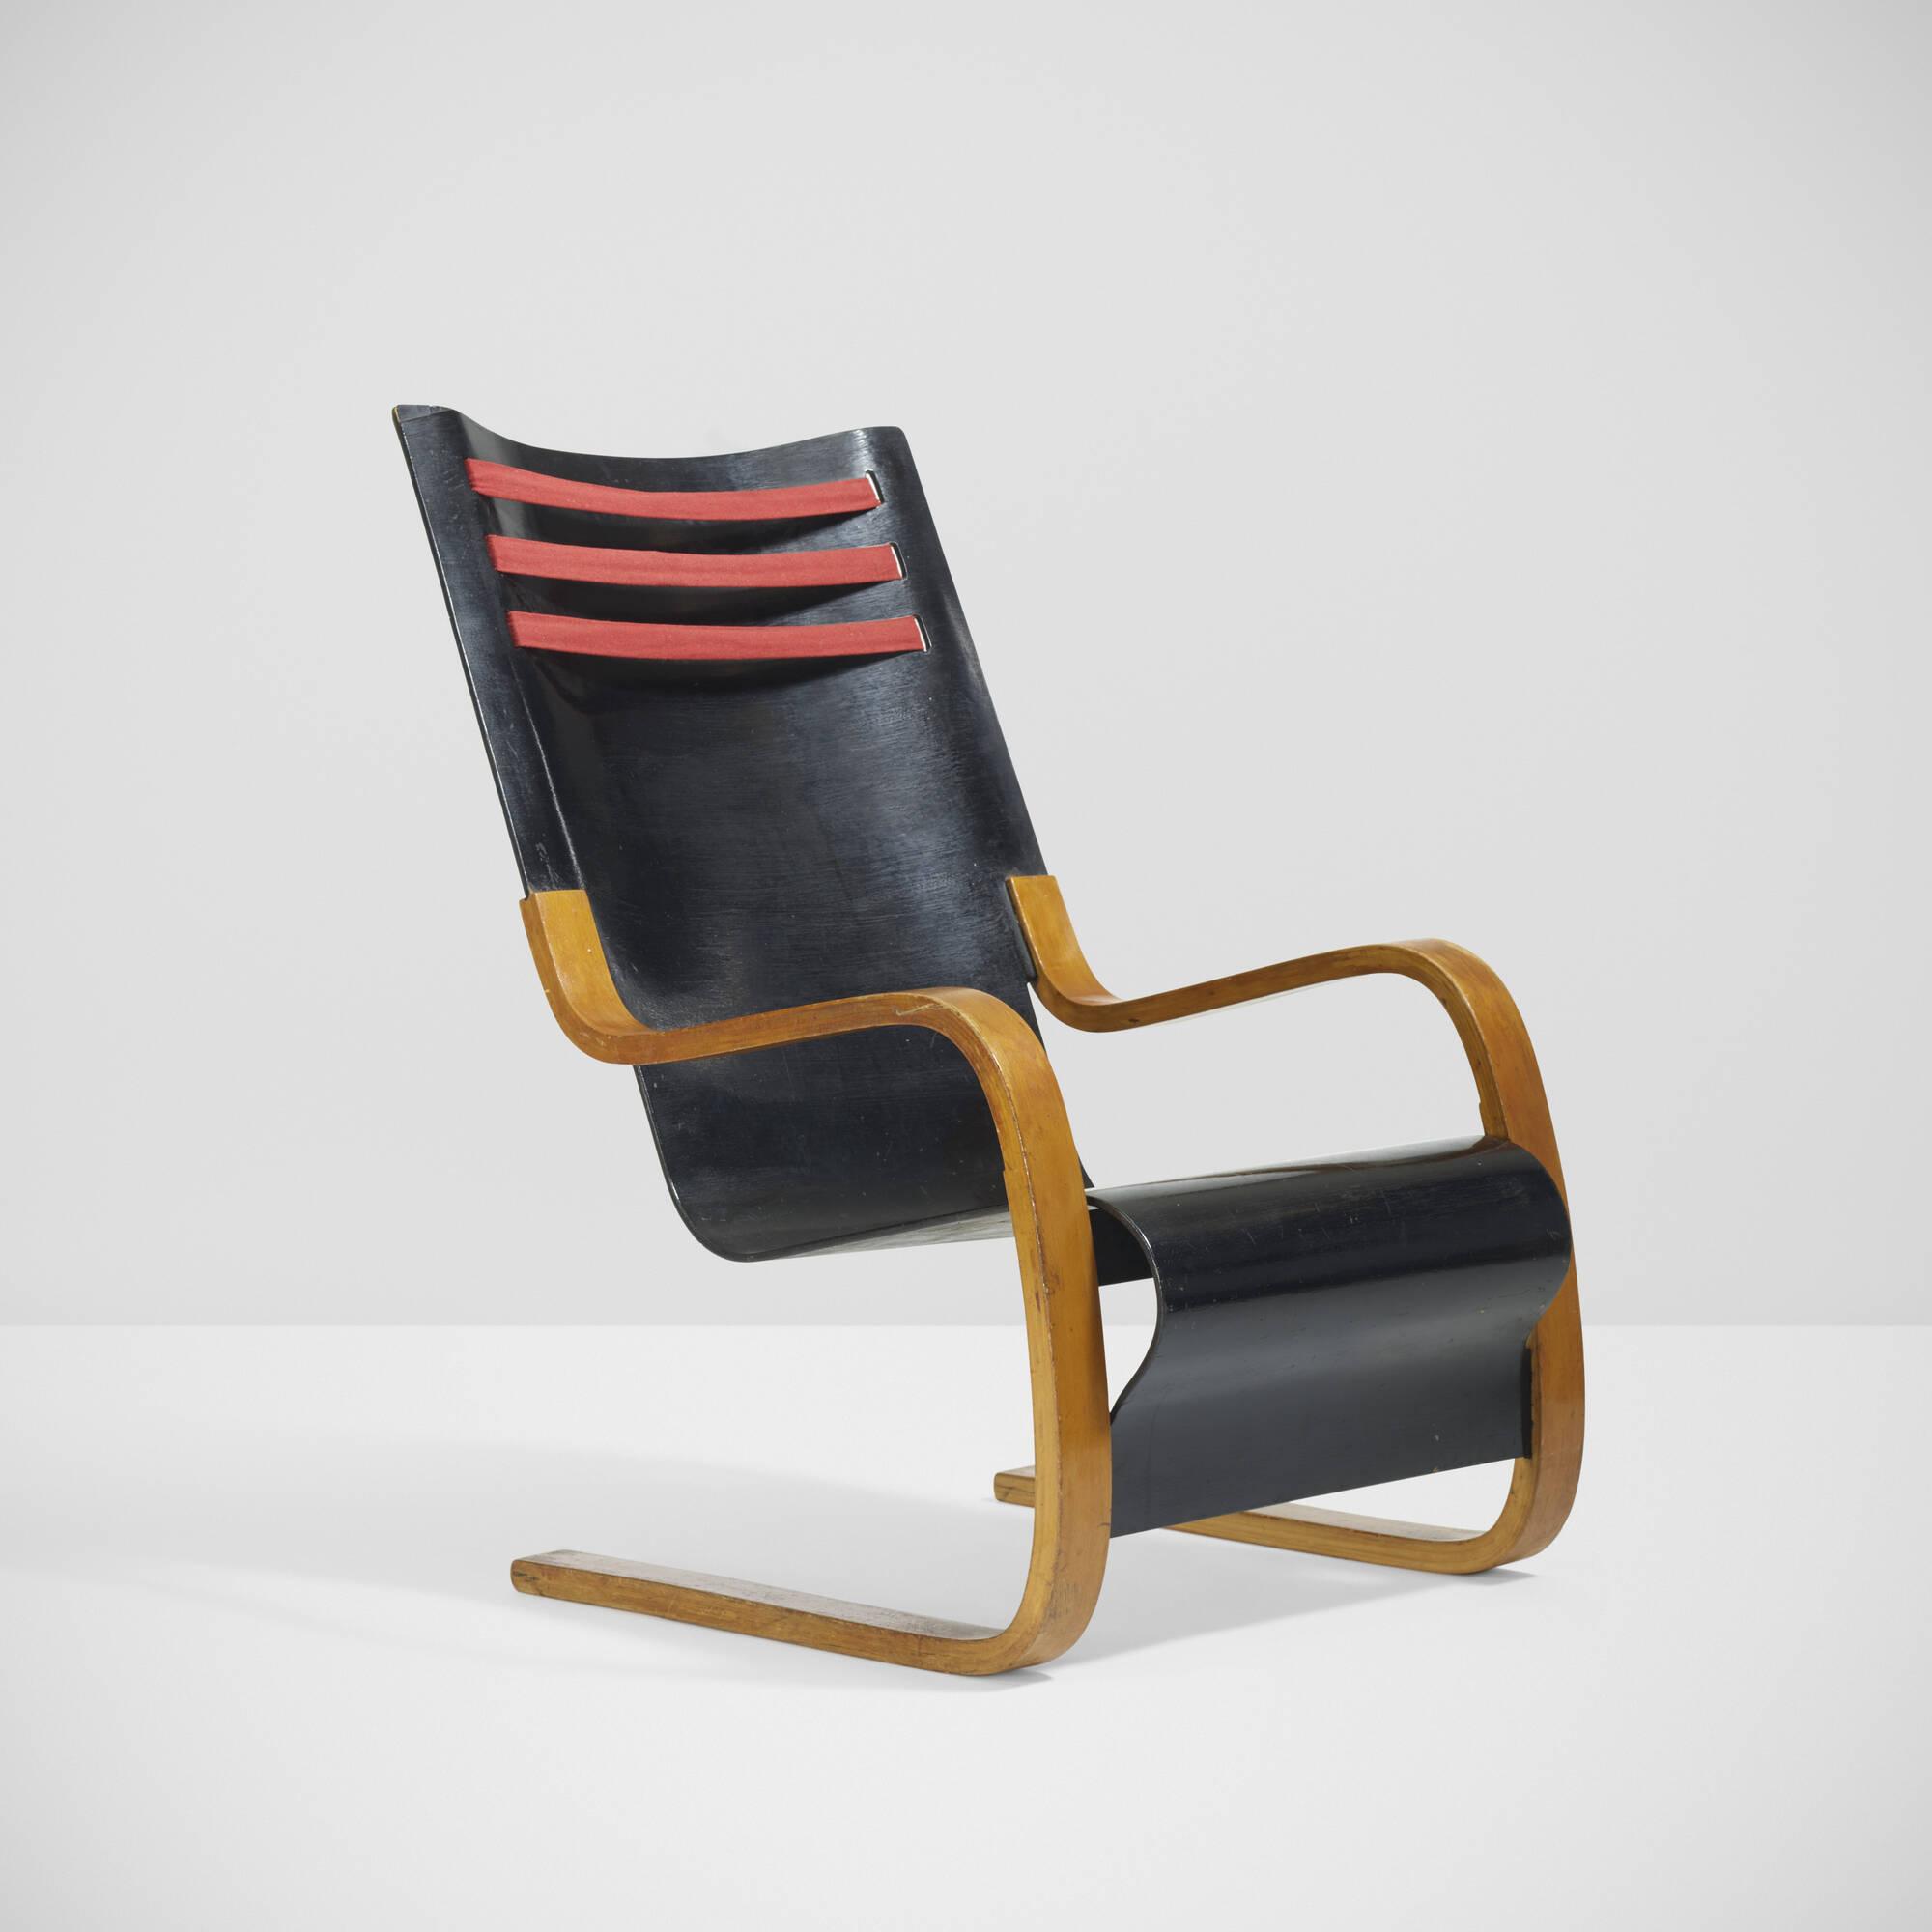 12: Alvar Aalto / Rare High Back Chair, Model 402 (1 Of 3